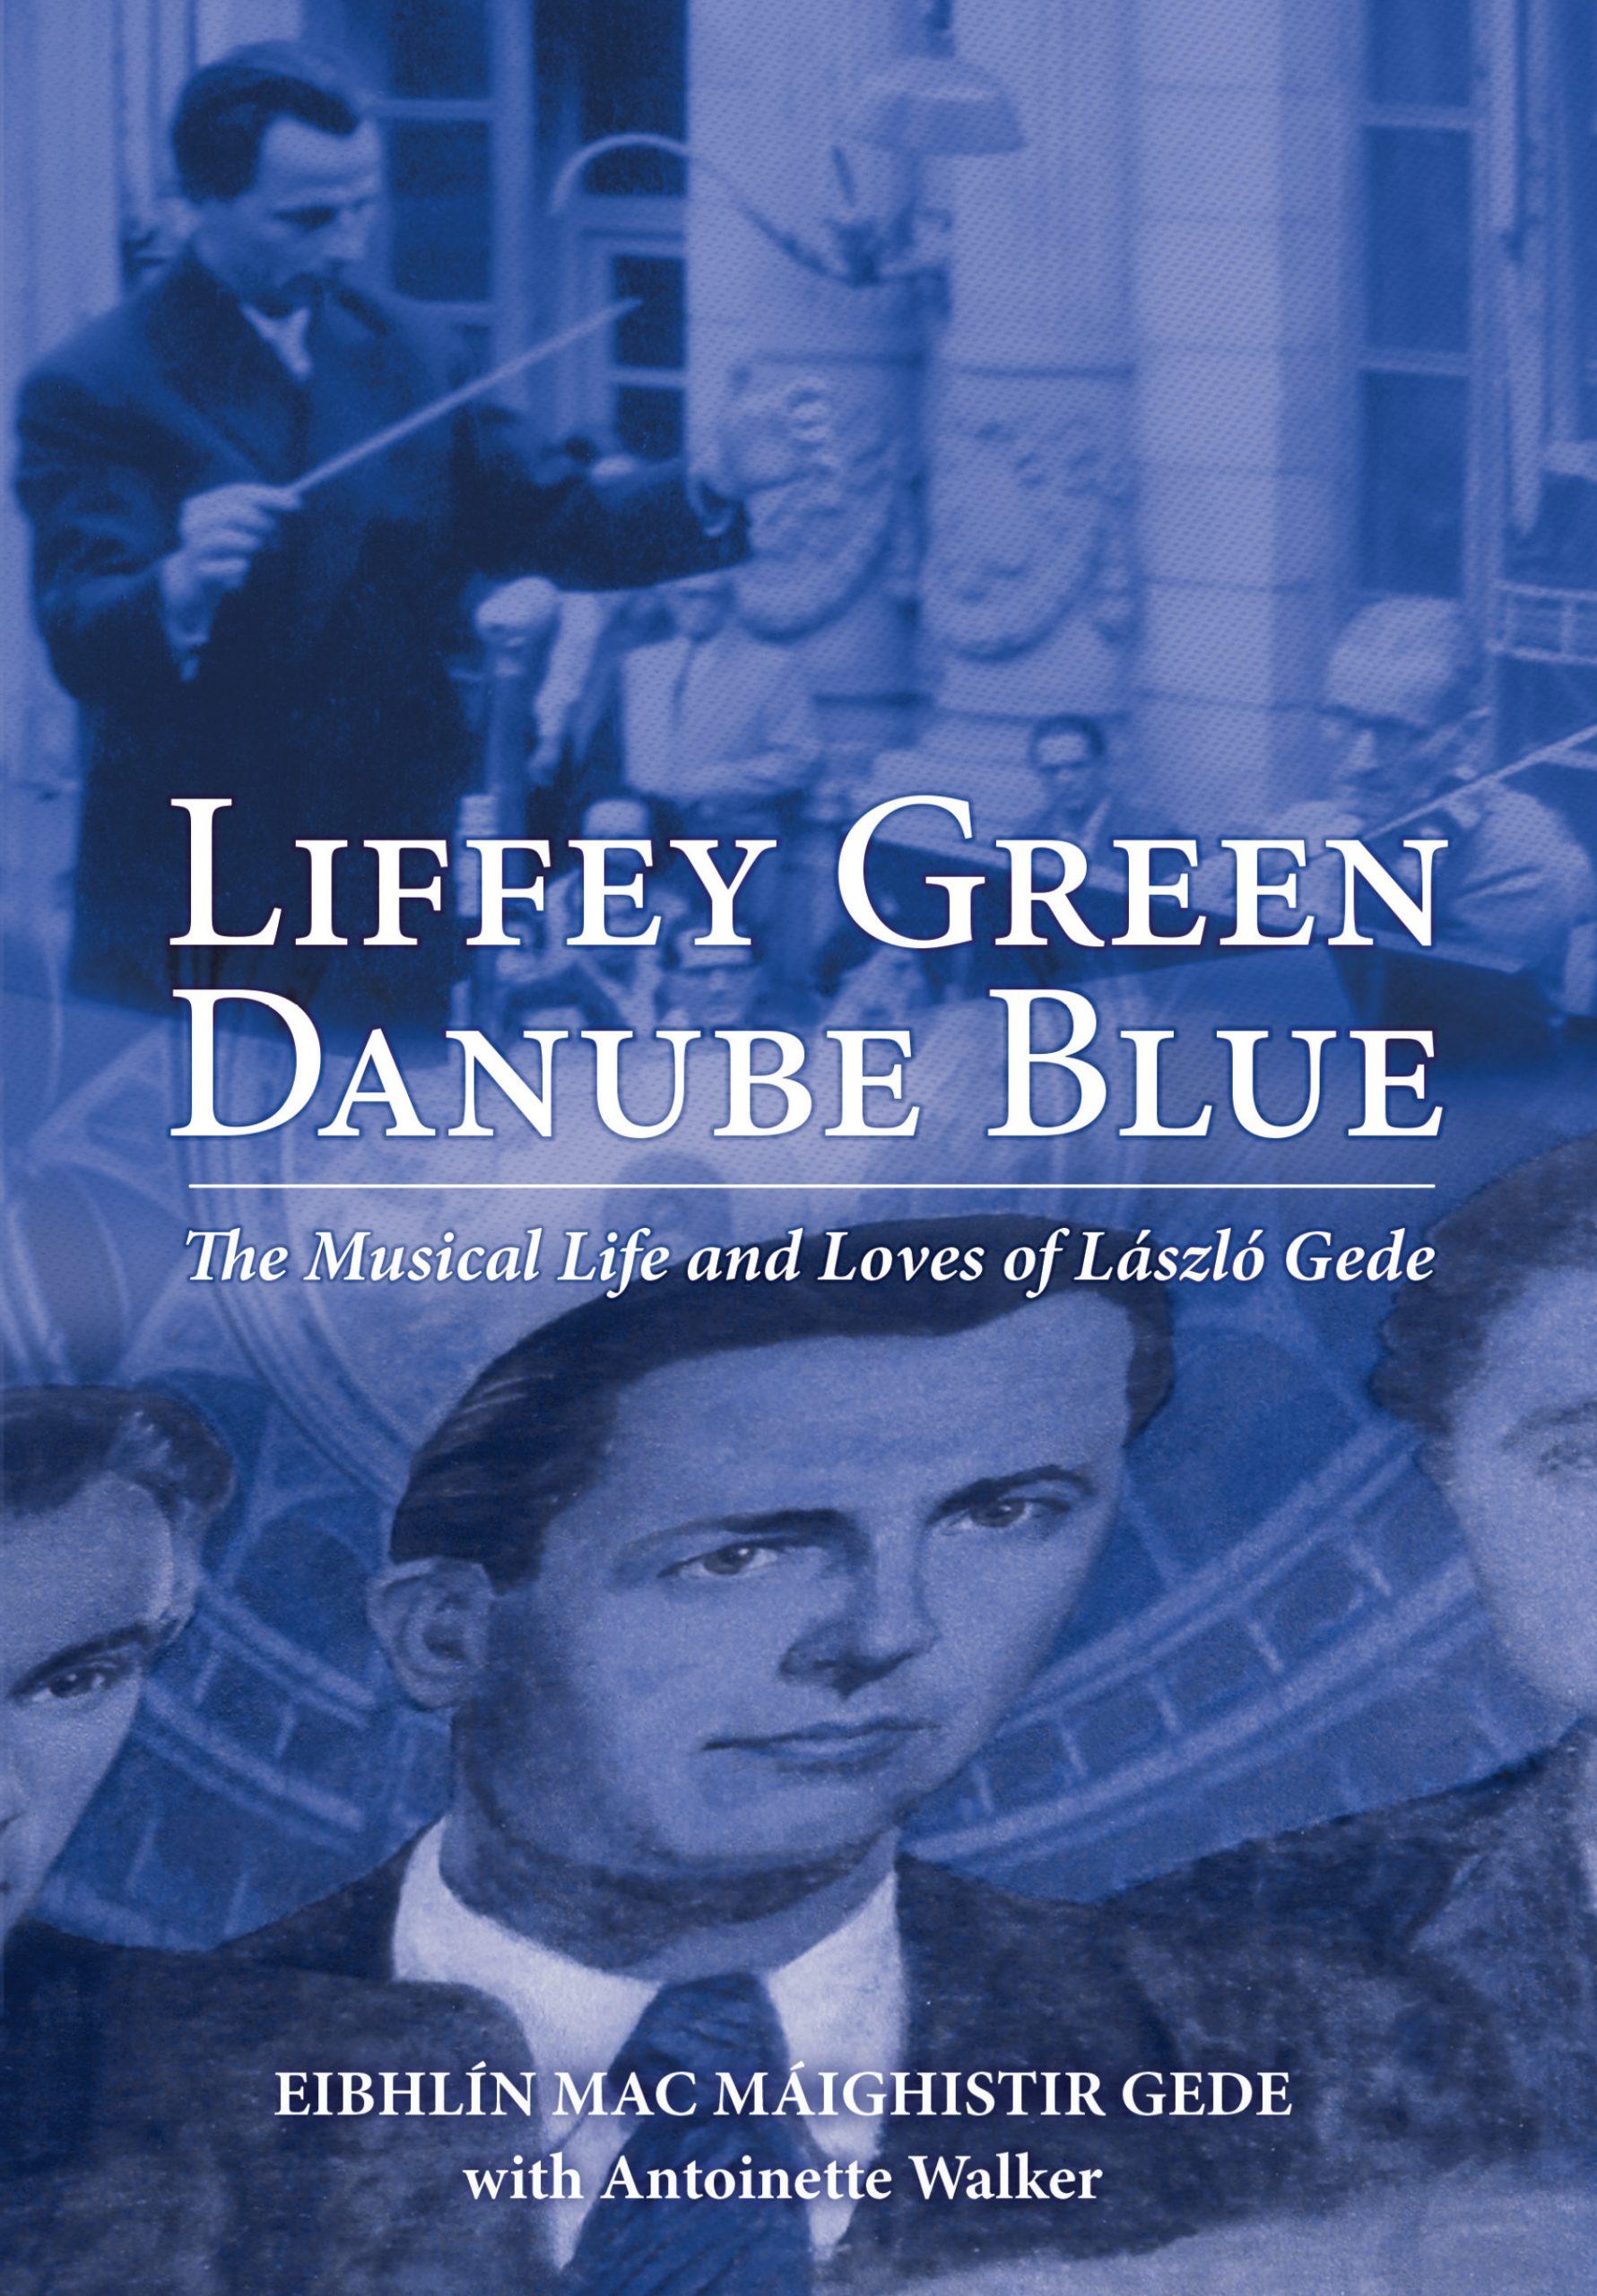 liffey-green-danube-blue